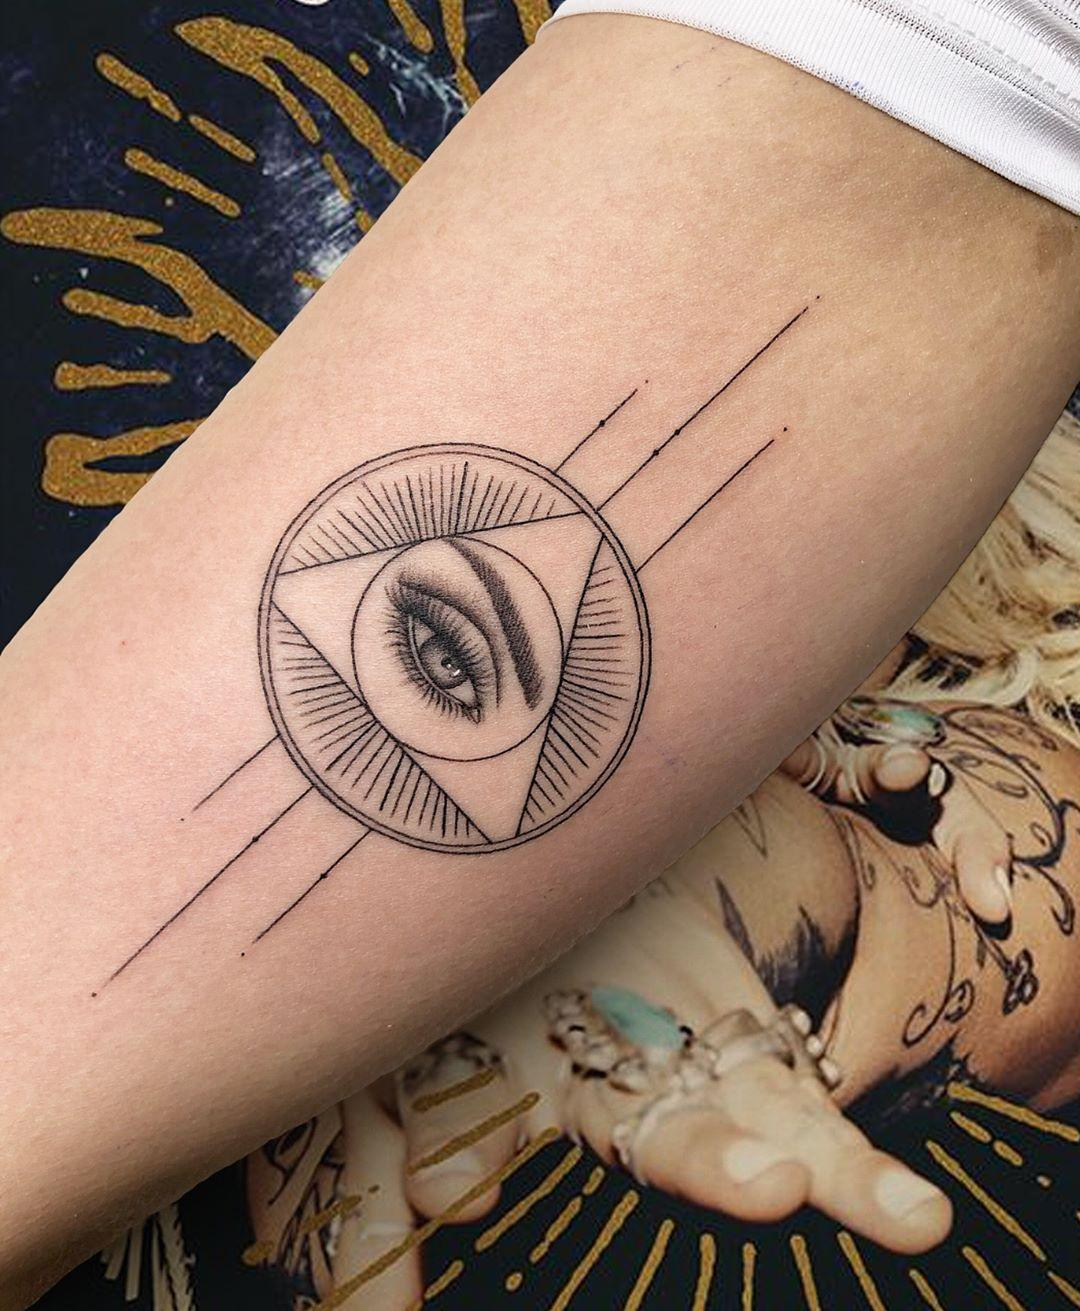 All-seeing eye by @joannamroman